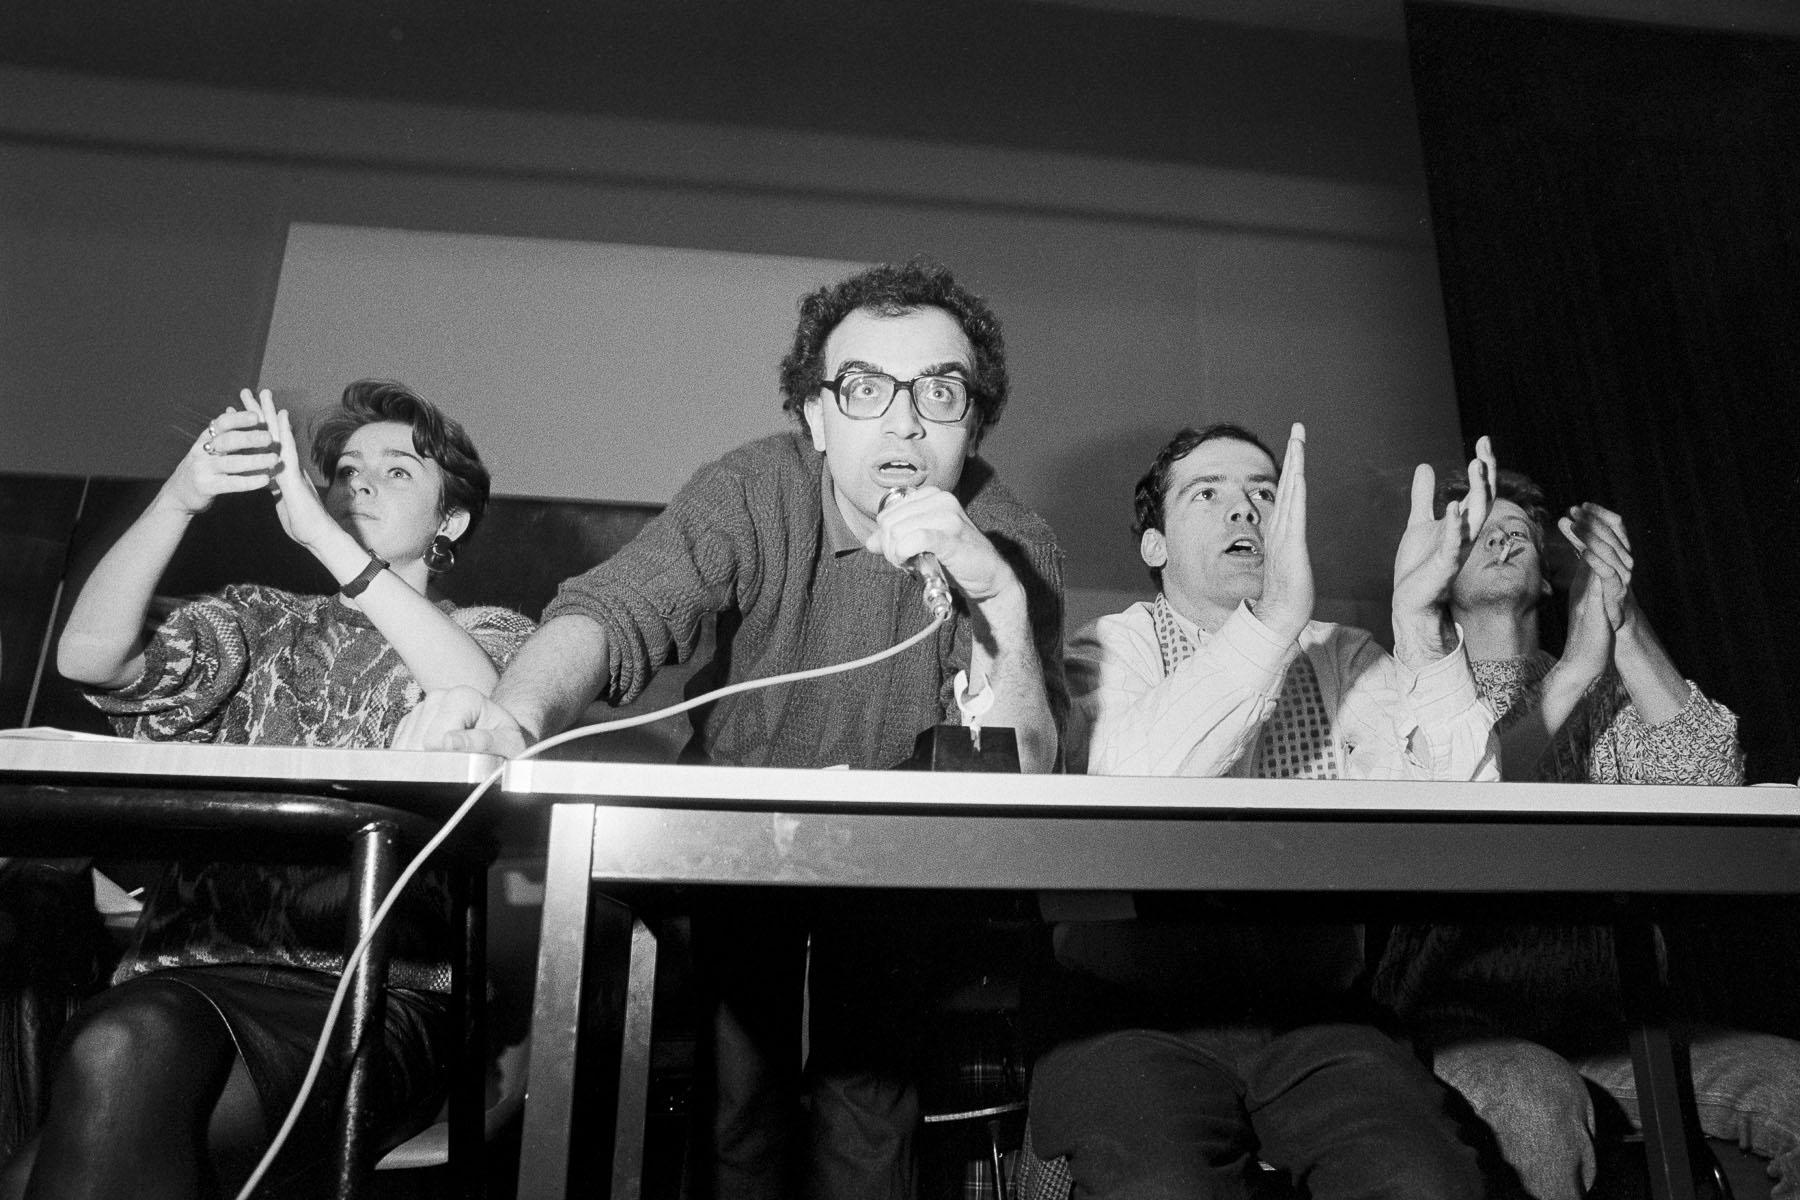 Students strike against Devaquet minister reform draft in Nanterre University on november 1986